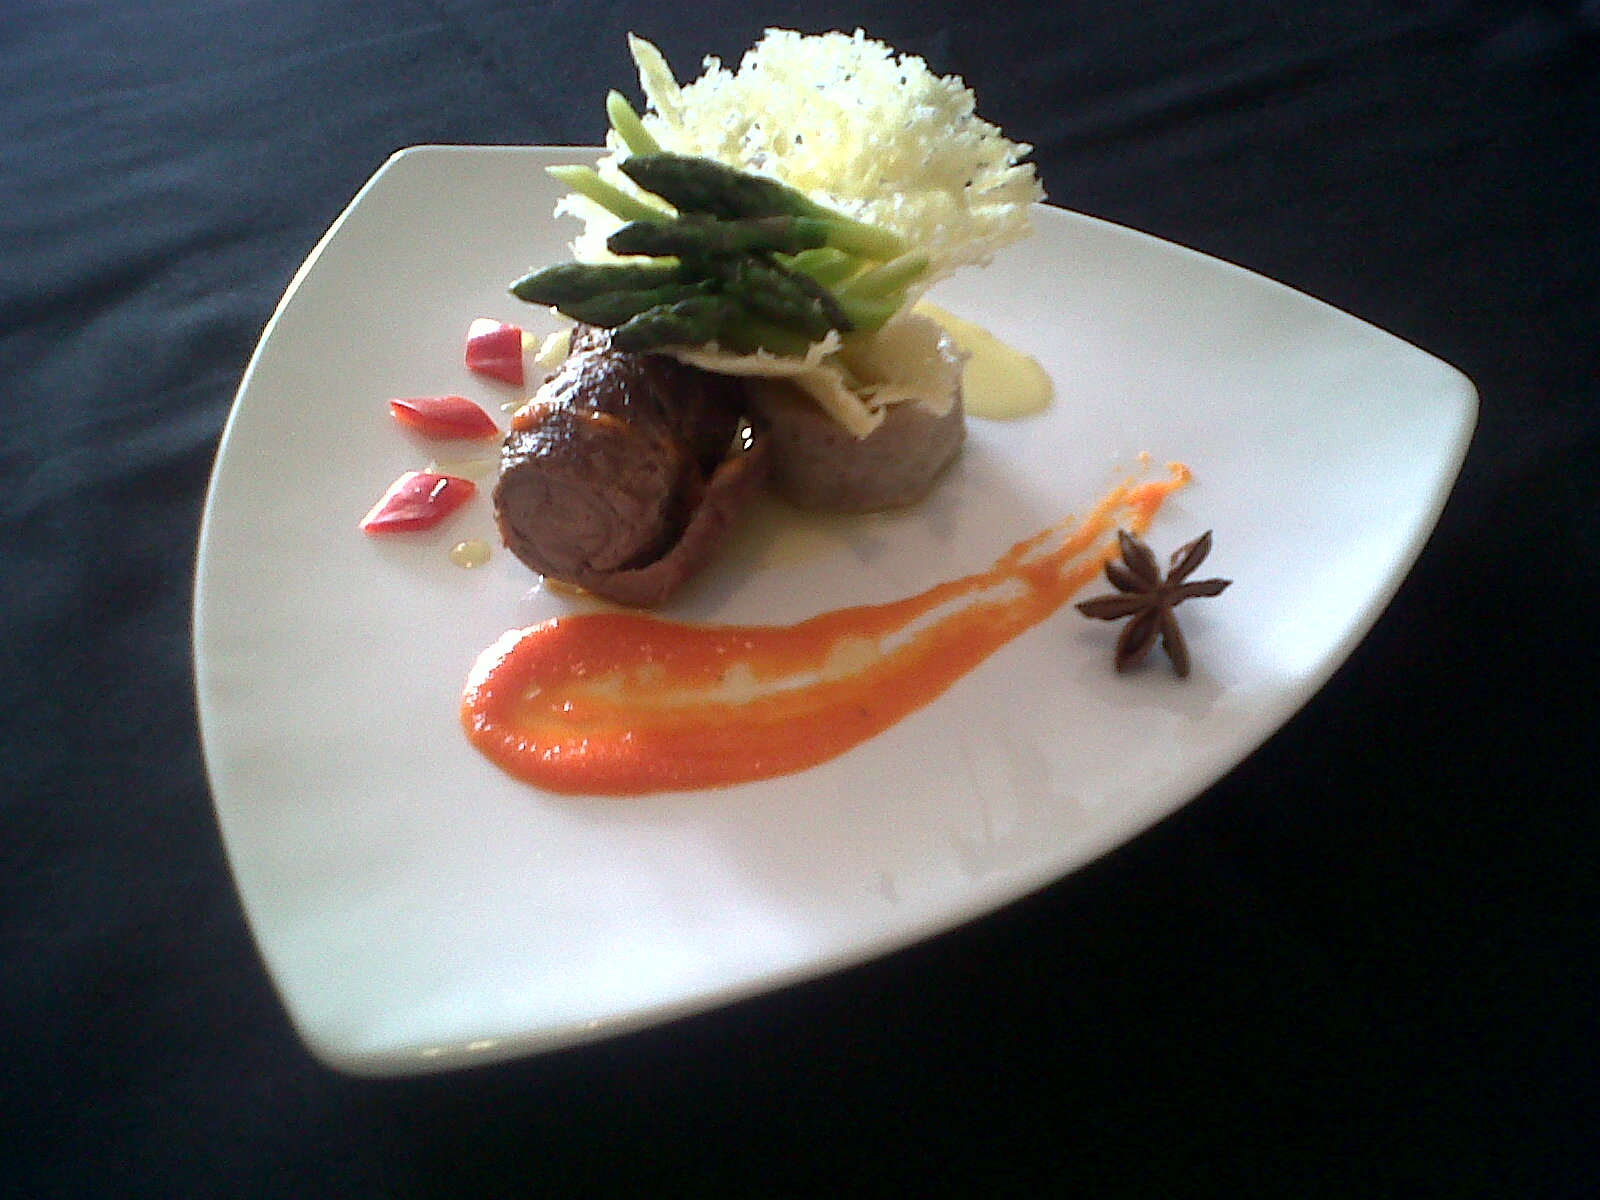 Mundo culinario decalogo para el montaje de platos for Platos para